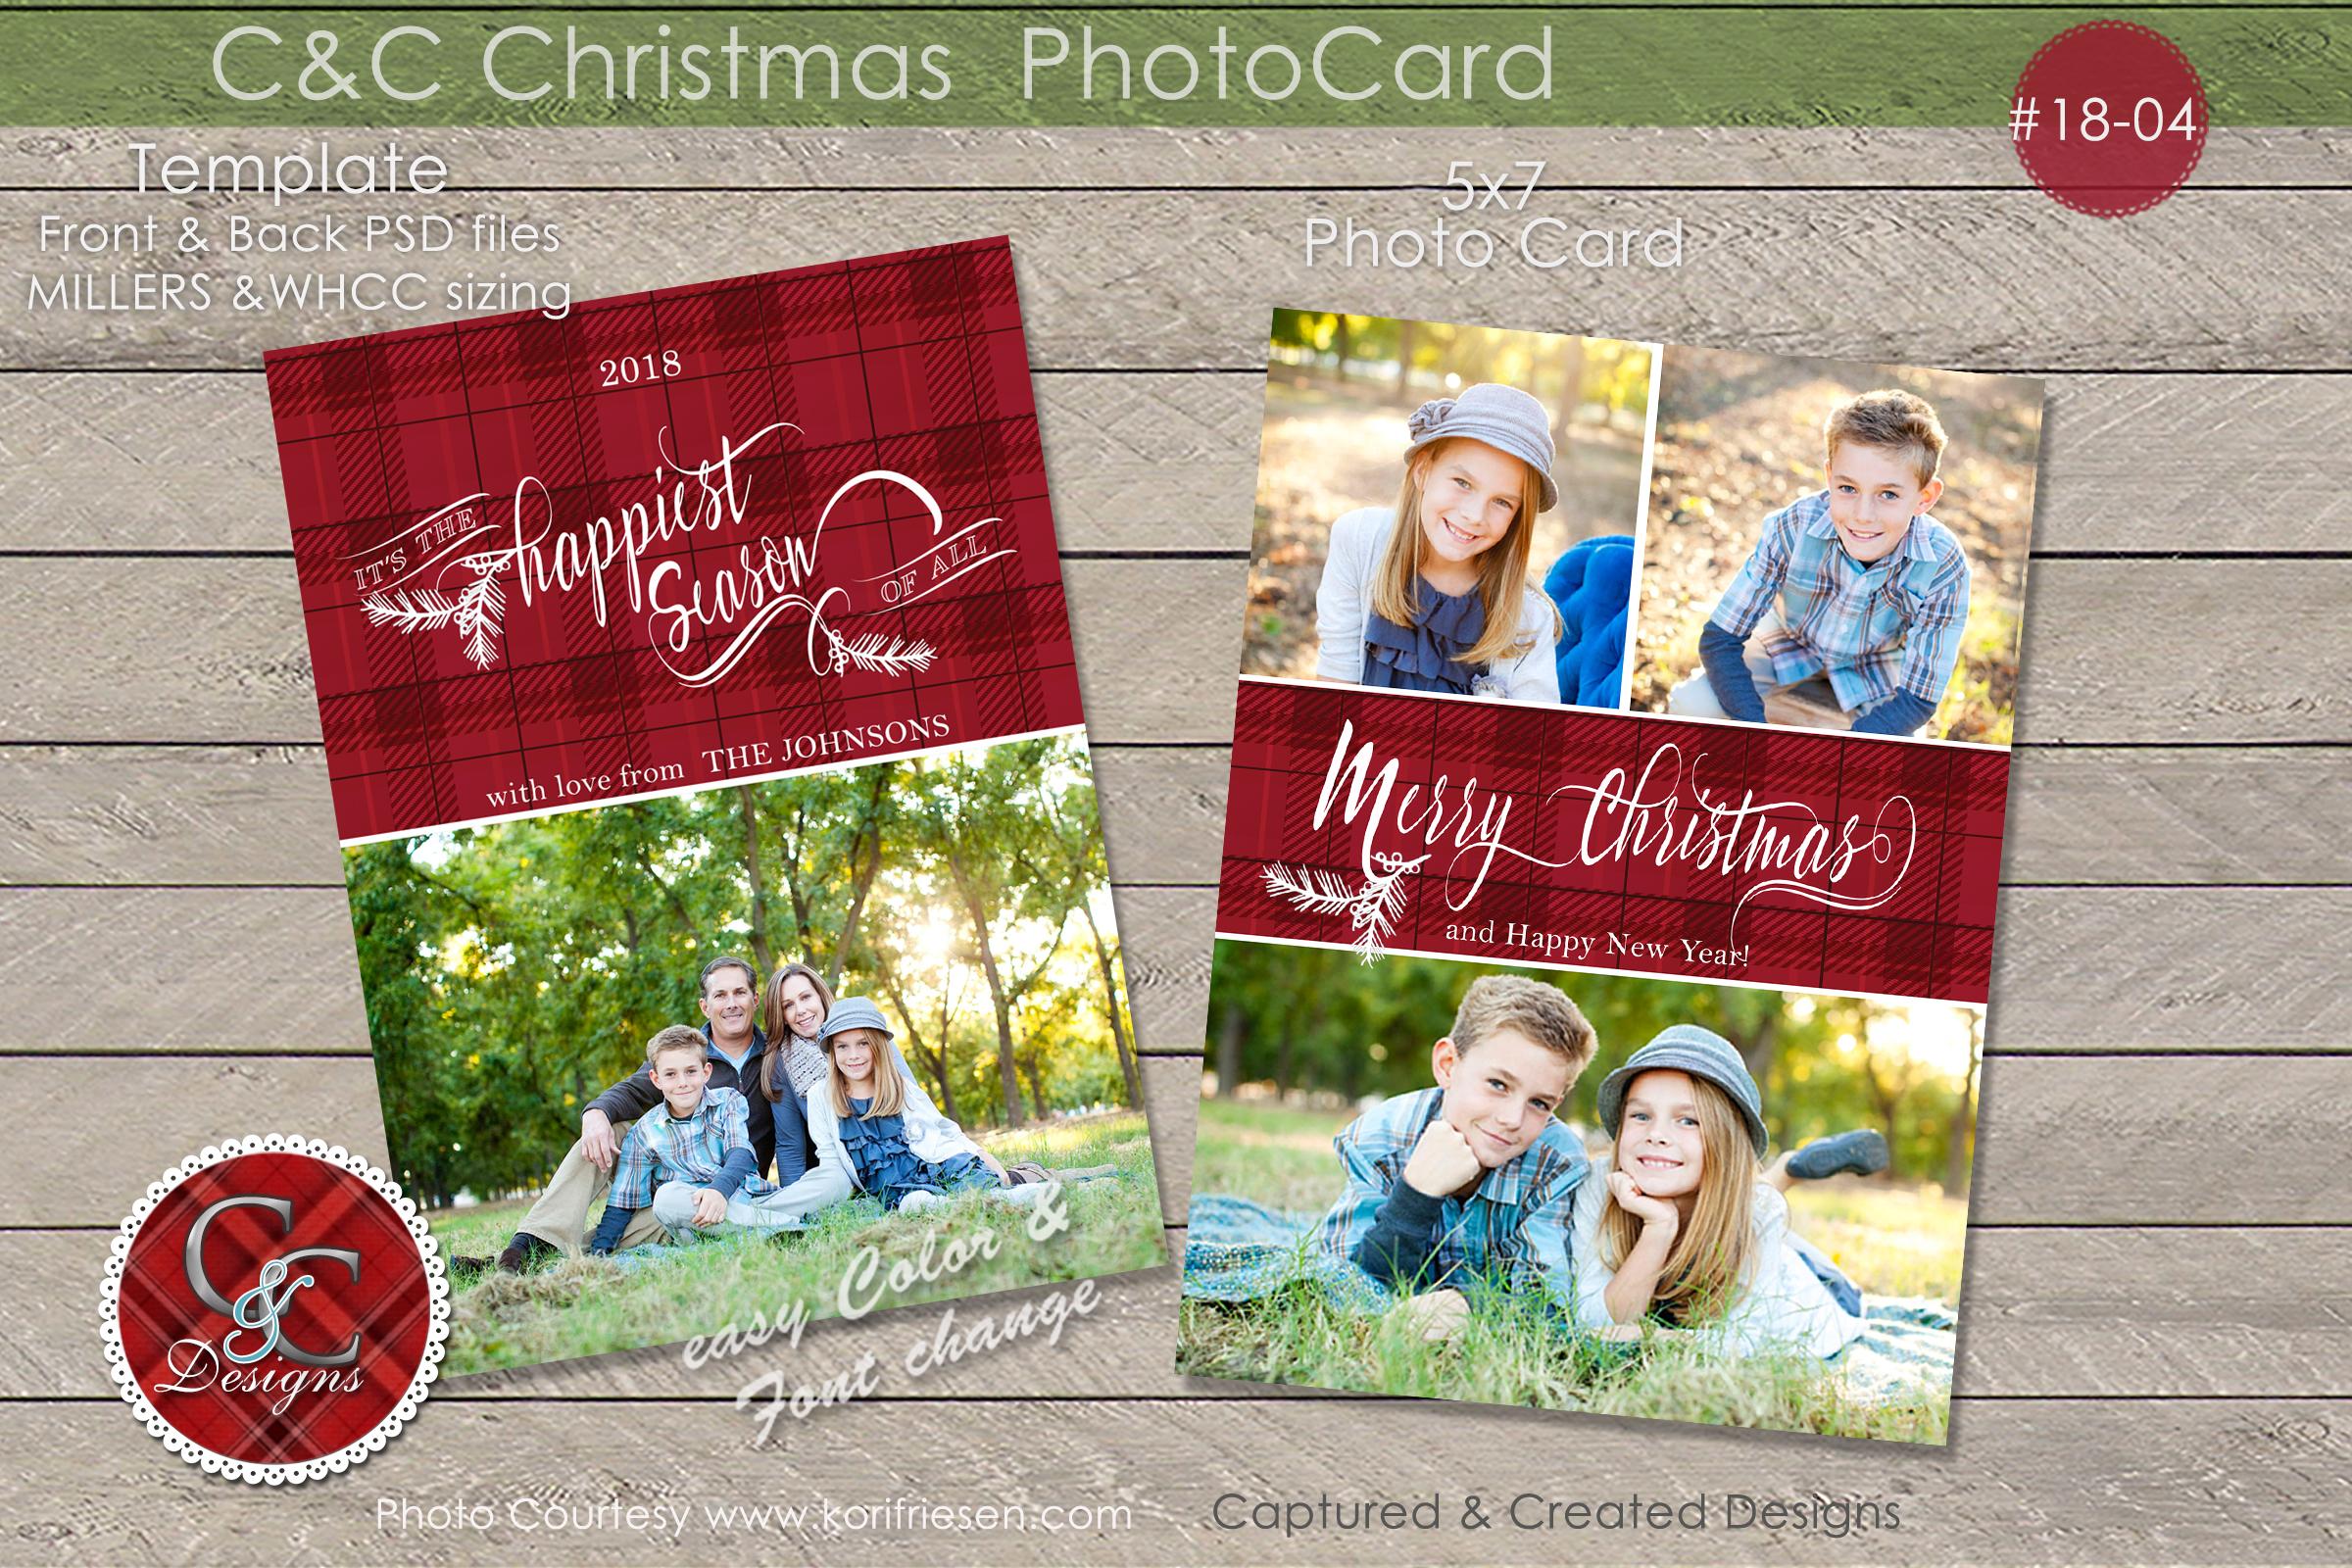 C&C Christmas Photo Card 18-04 example image 1